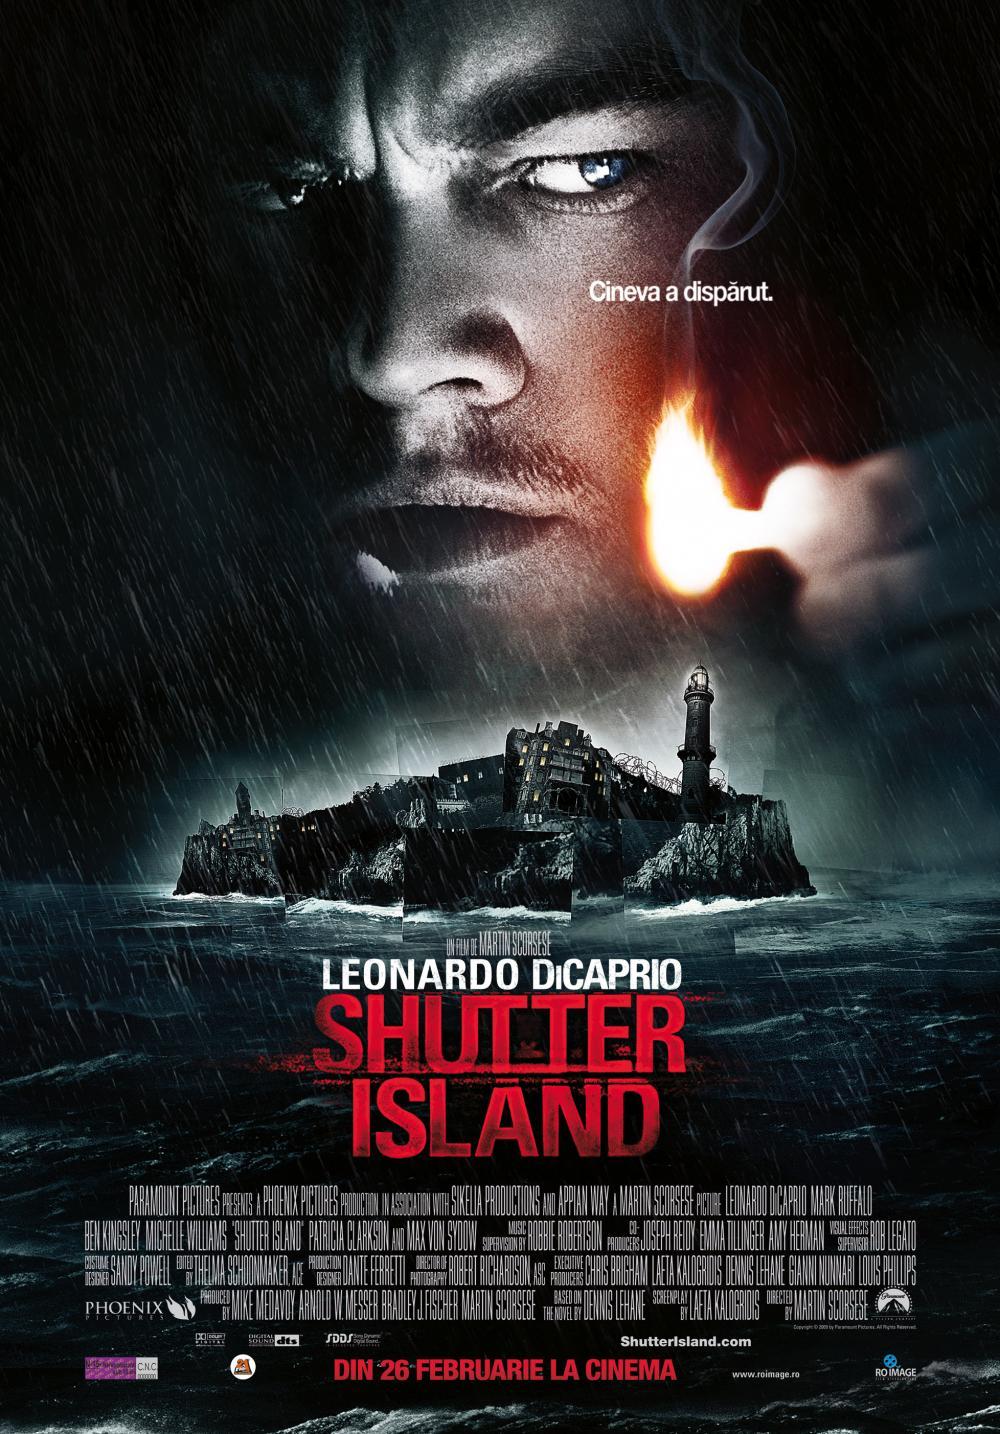 SHUTTER ISLAND SHUTTER ISLAND